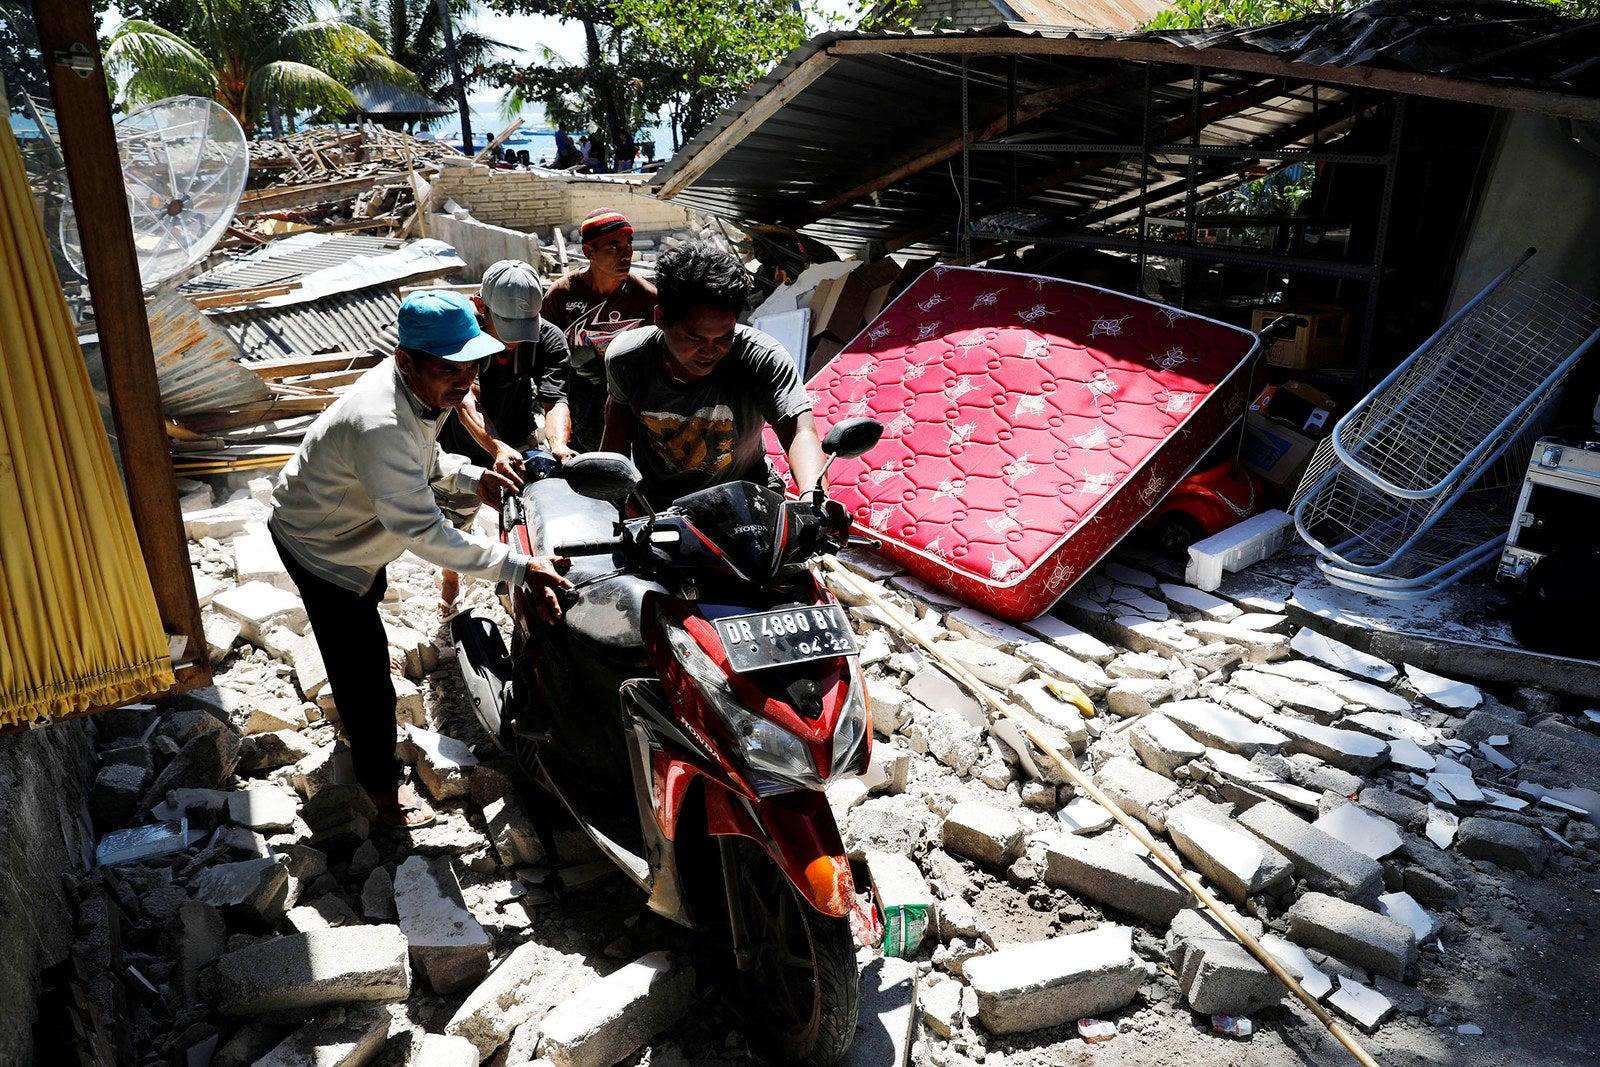 Villagers push a motorcycle through ruins in Pamenang.